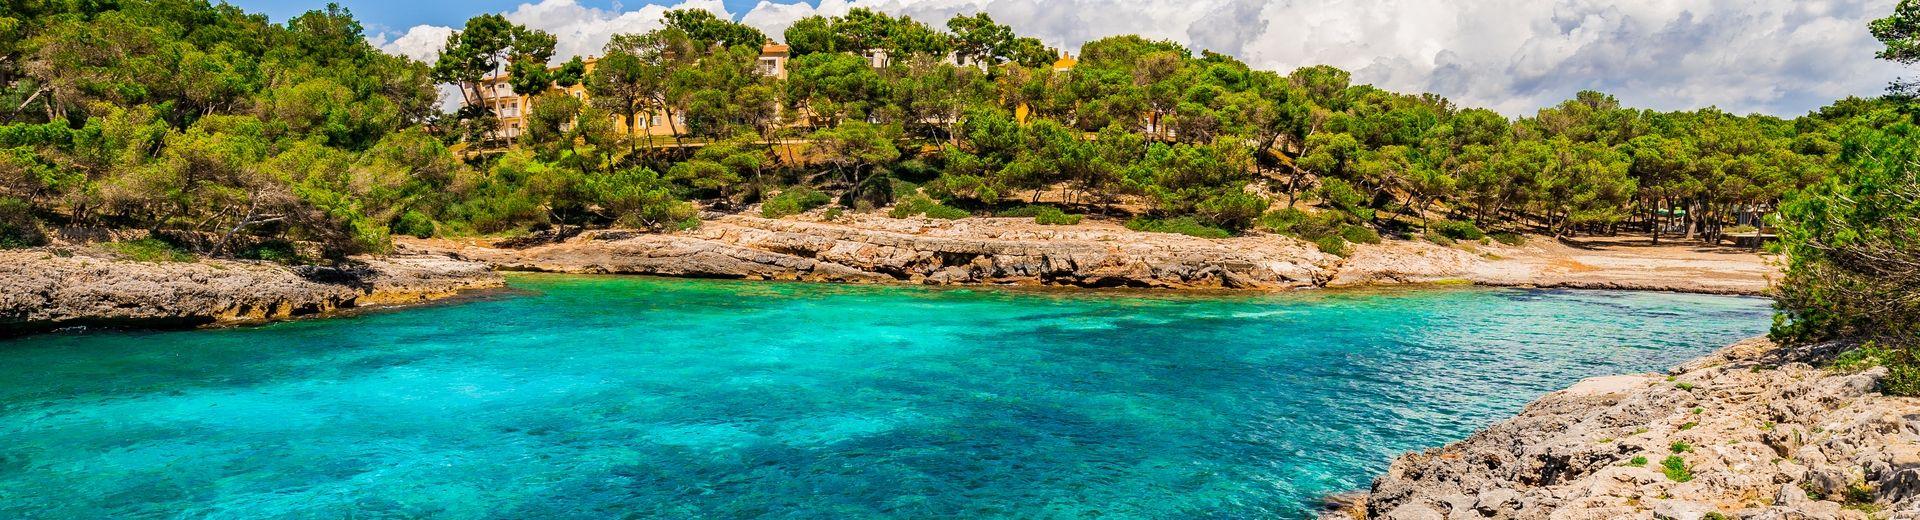 Familienurlaub auf Mallorca im August